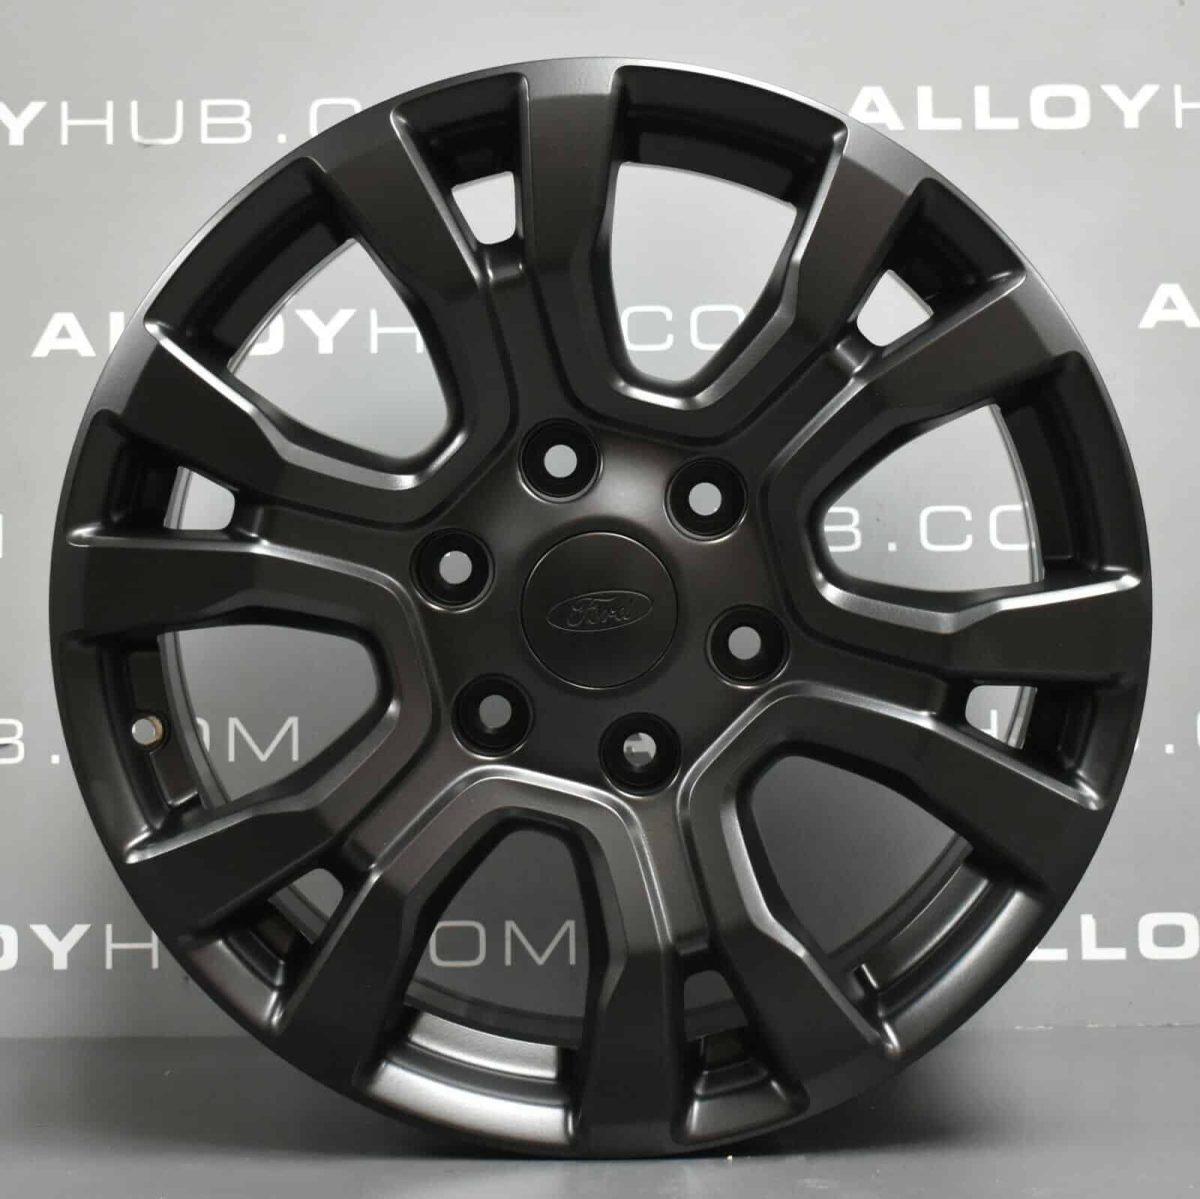 "Genuine Ford Ranger Wildtrak 18"" inch Alloy Wheels with Satin Black Finish AB39-1007-EA"